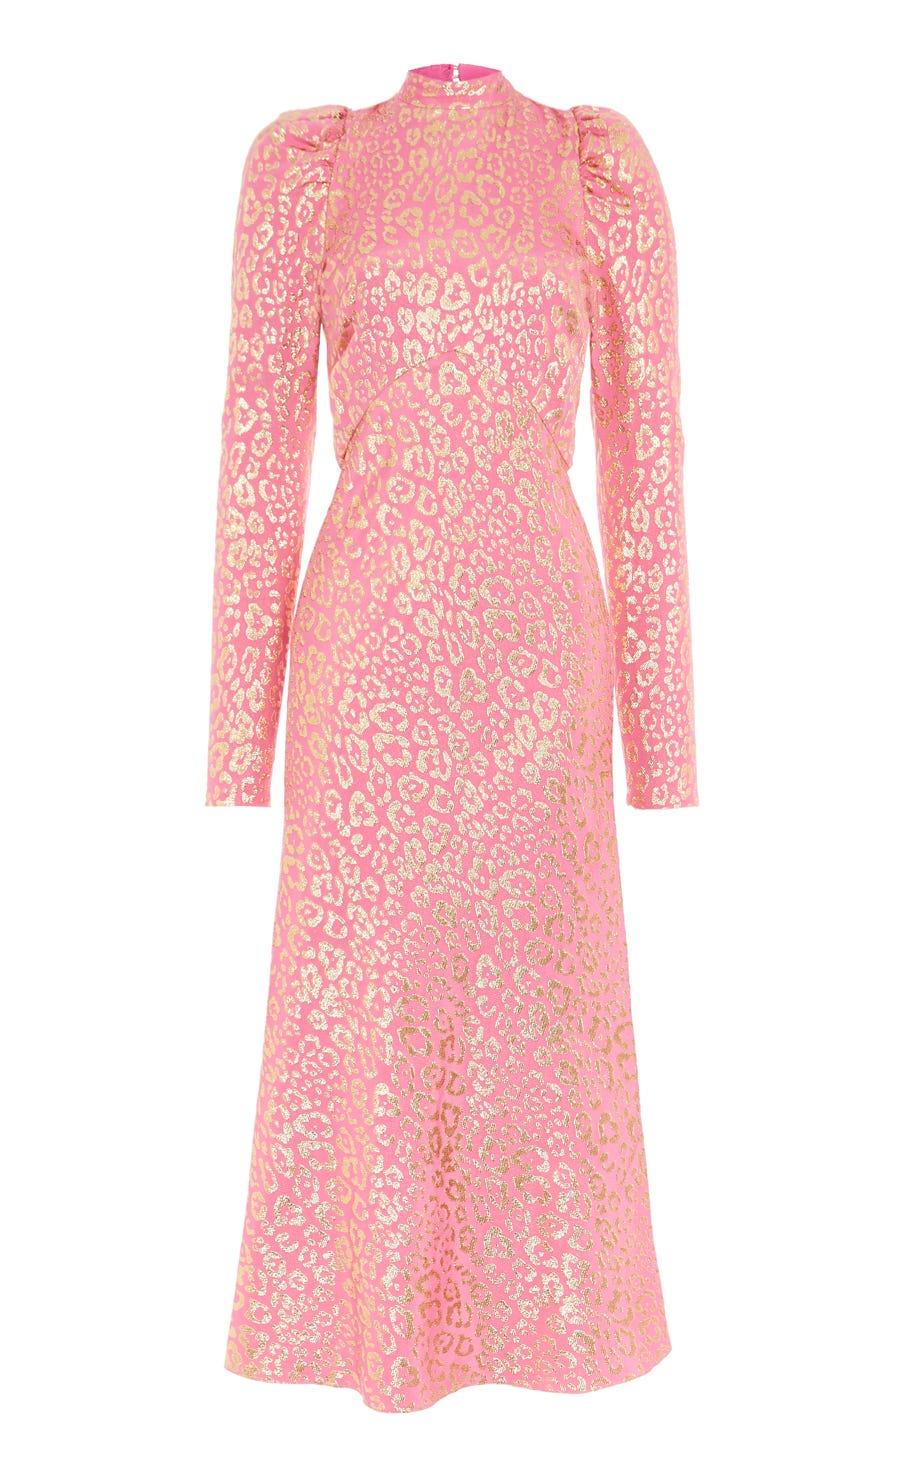 Sunset Midi Dress